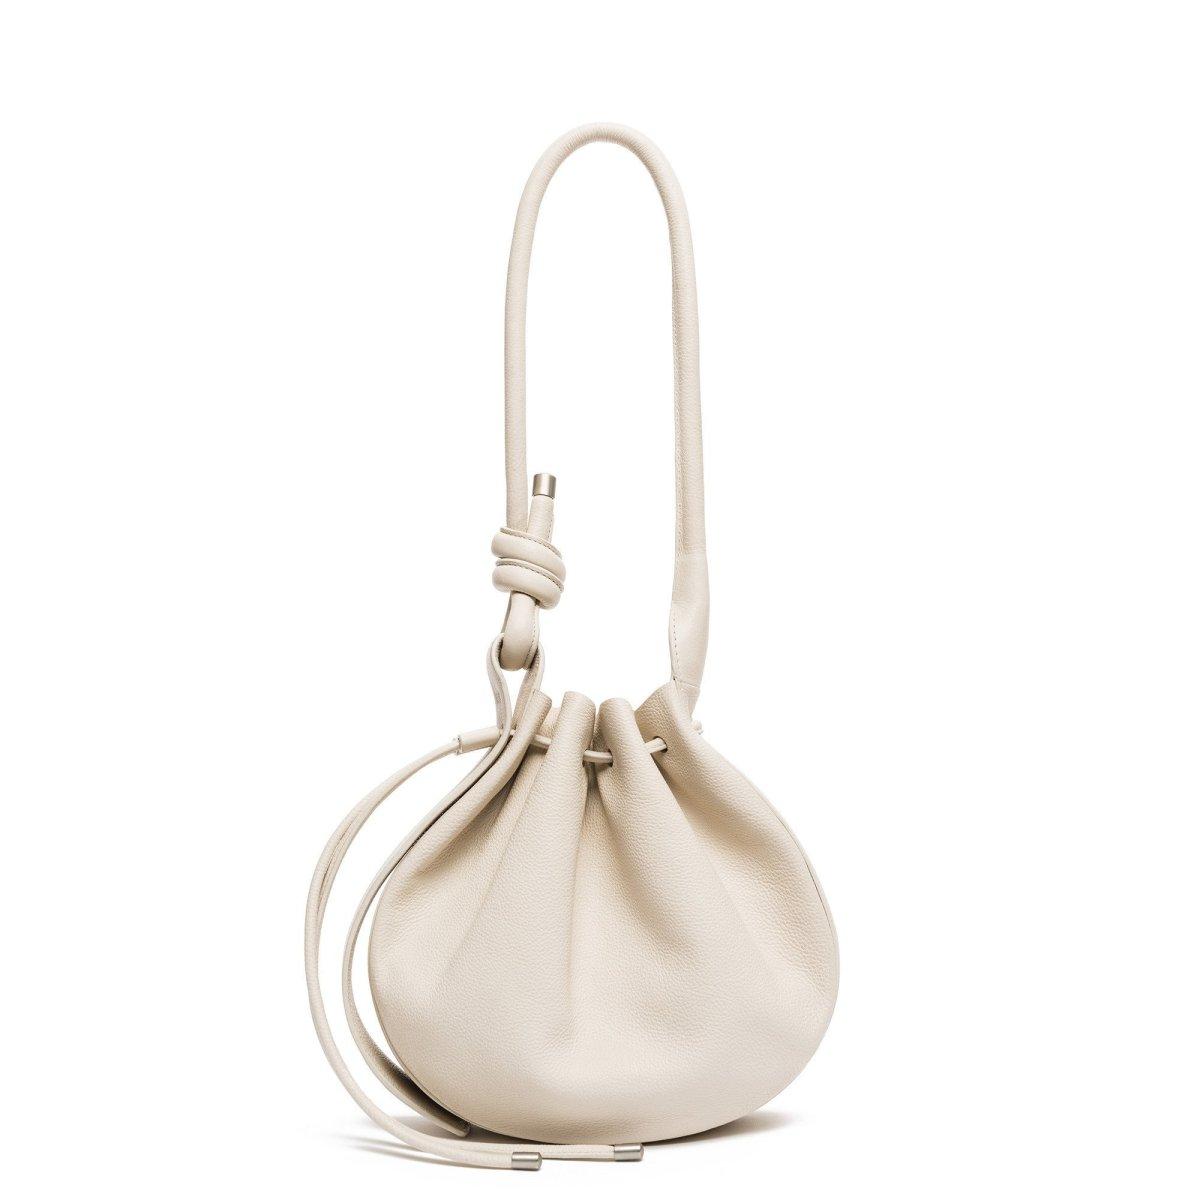 Behno bucket bag, $375, available at Joon + Co.